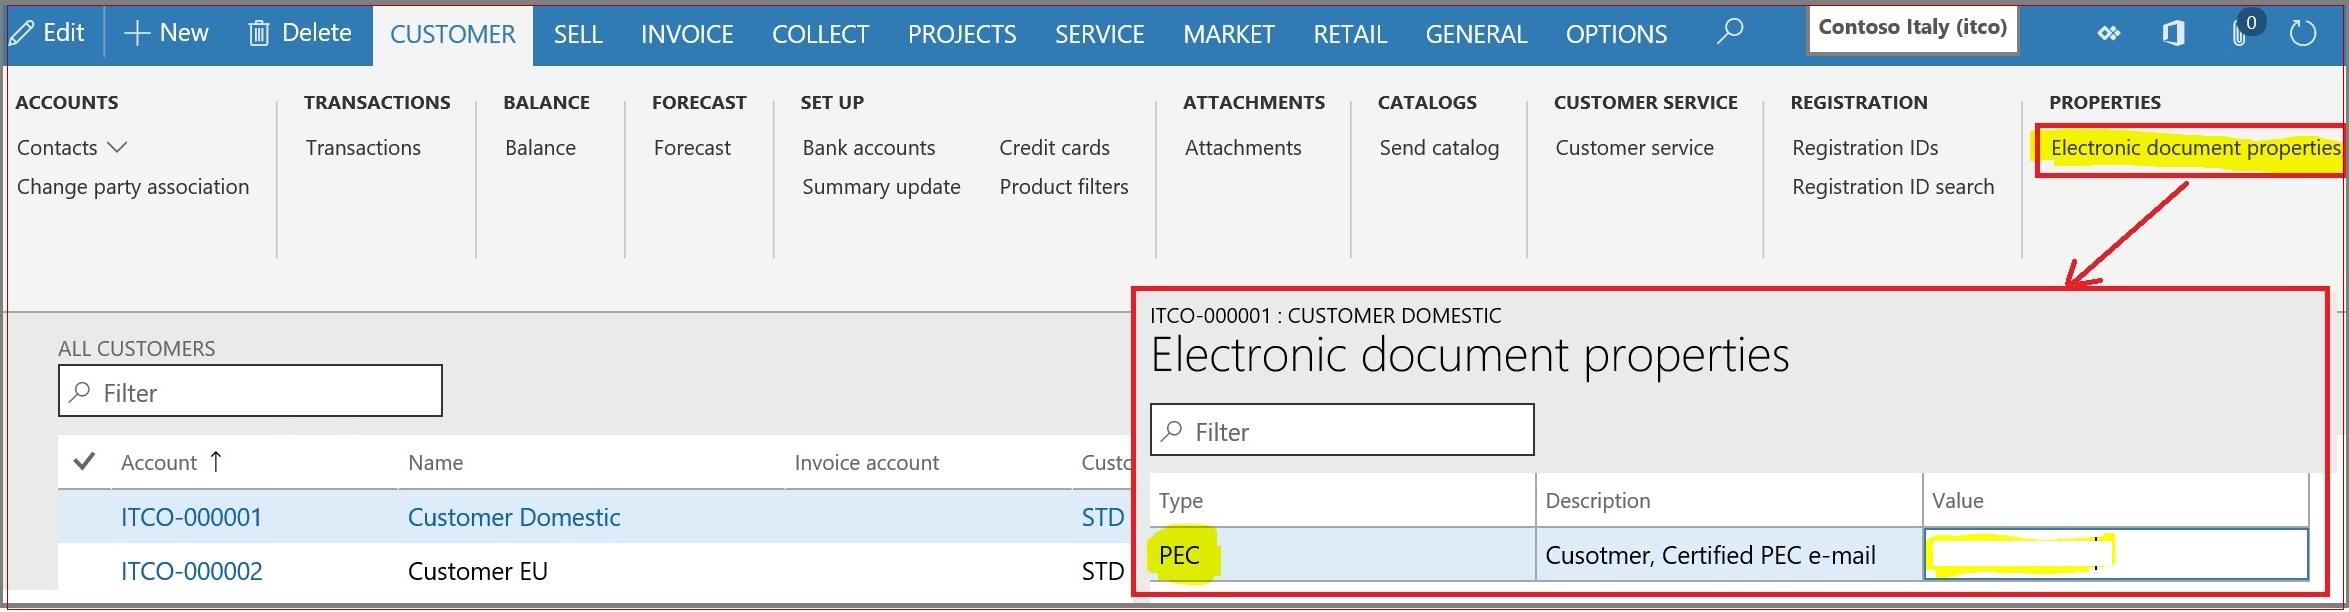 PEC property on Customer level